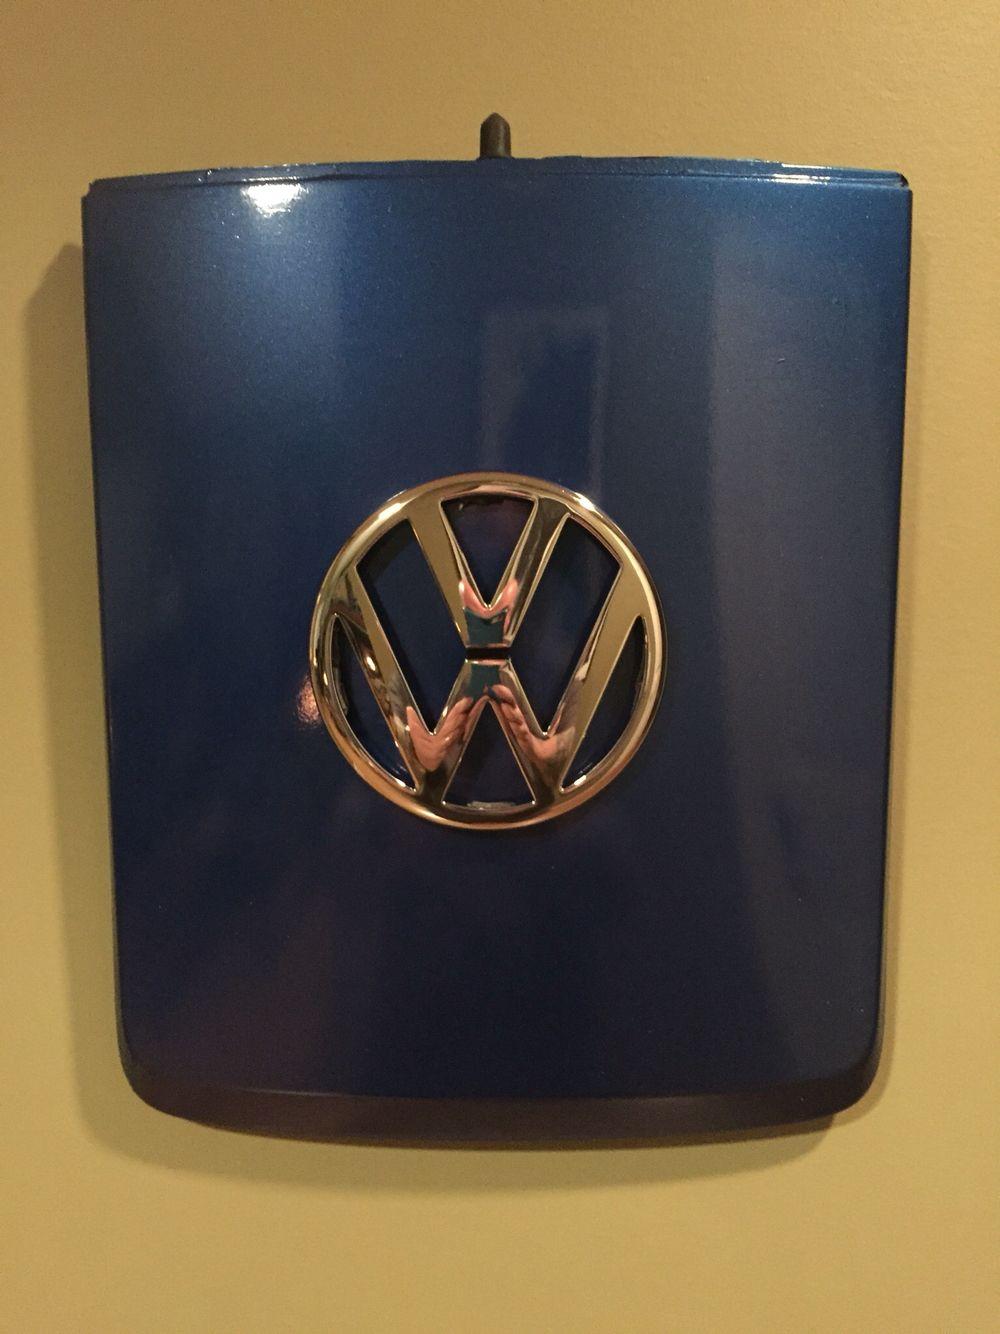 Dash Emblem Attached Vw Fox Volkswagen Logo Audi Gt